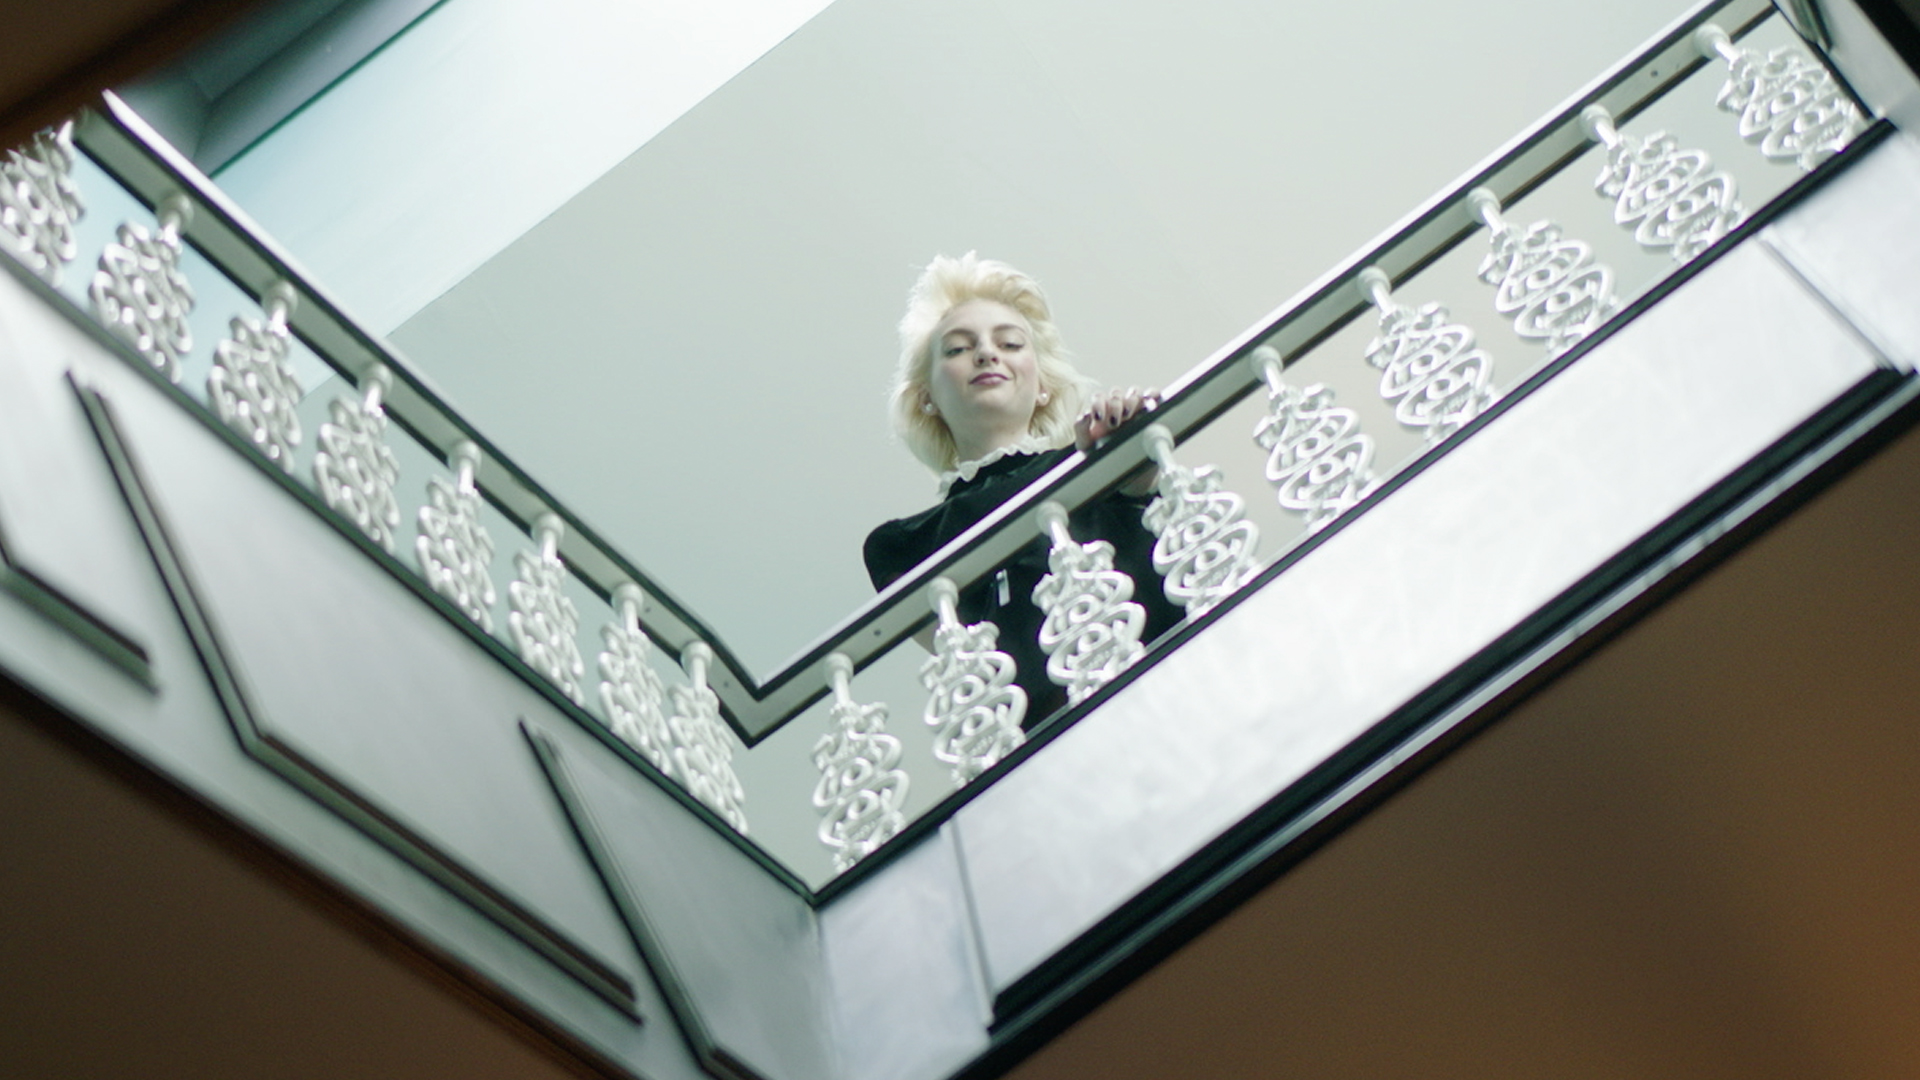 John Frieda – John Frieda Presents: THAT Blonde